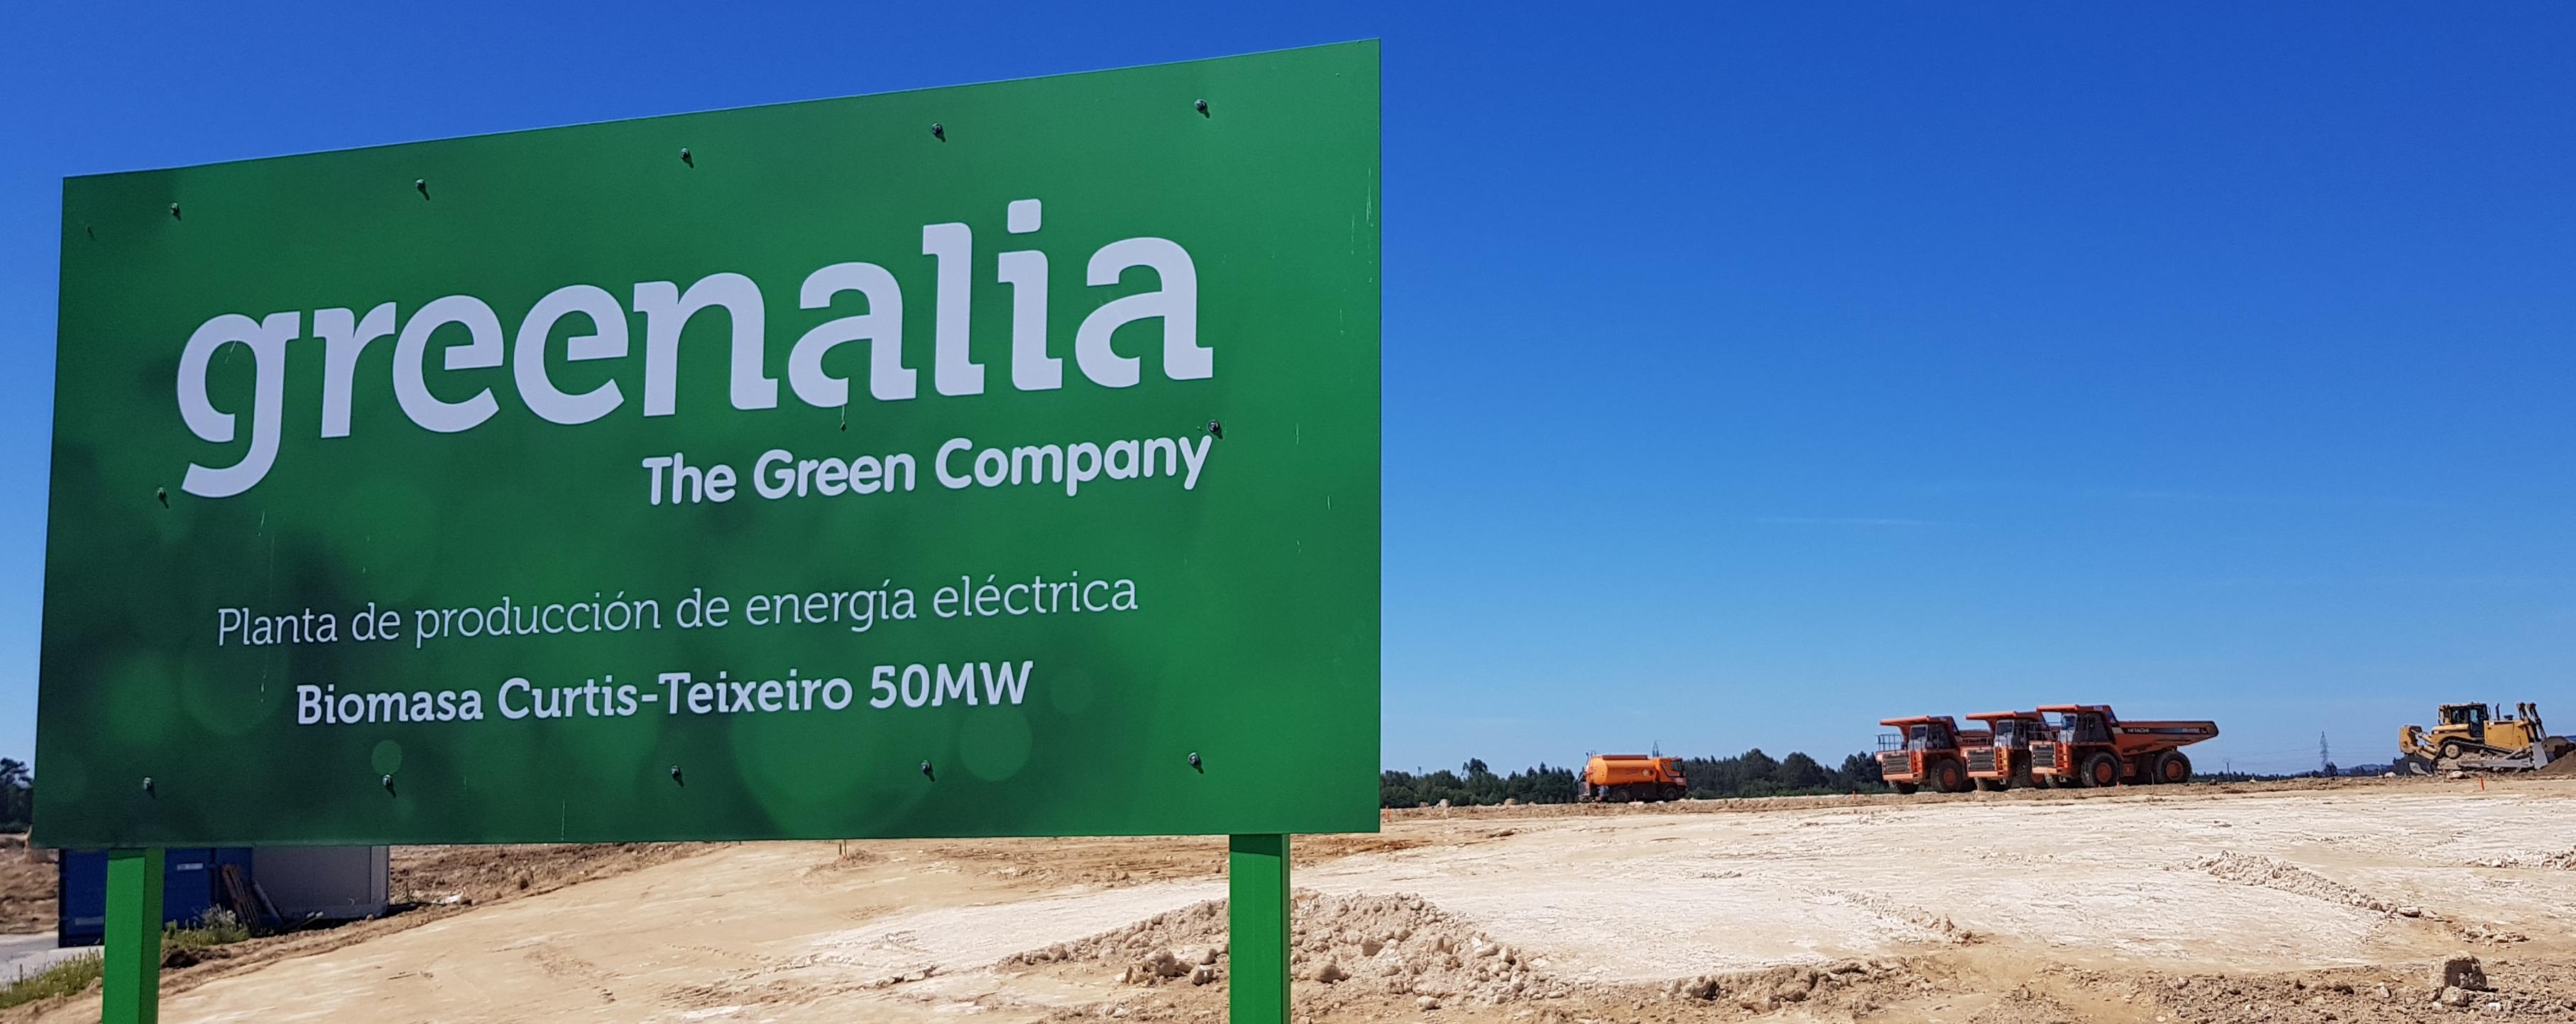 ACCIONA Industrial and IMASA to build and maintain Greenalia